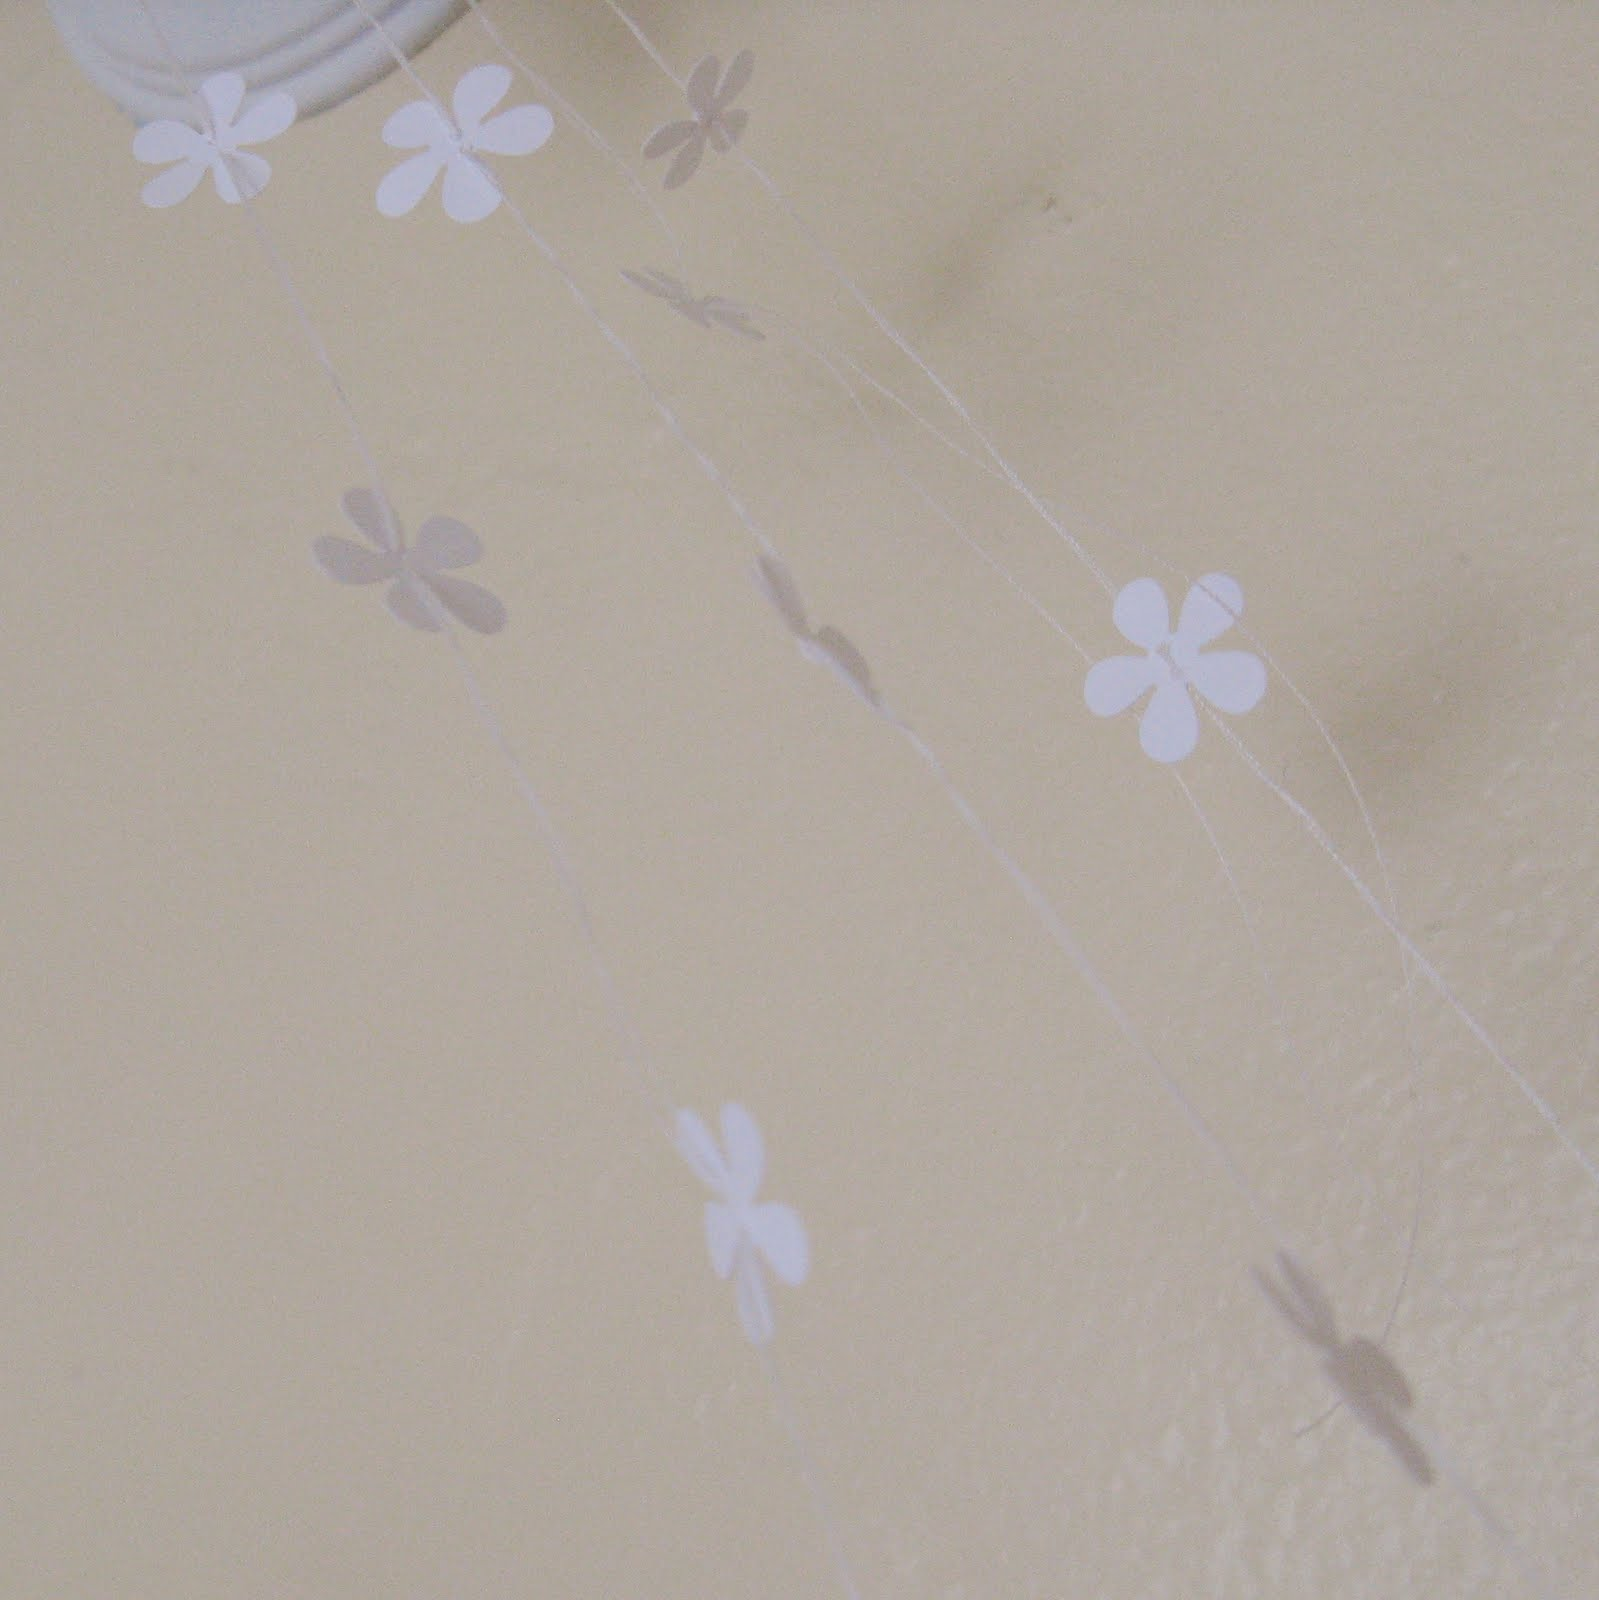 http://3.bp.blogspot.com/-ufPq2wHVOzc/TeTfi0hN1JI/AAAAAAAAA-k/6FVXhwmd33w/s1600/whiteflowers2.JPG